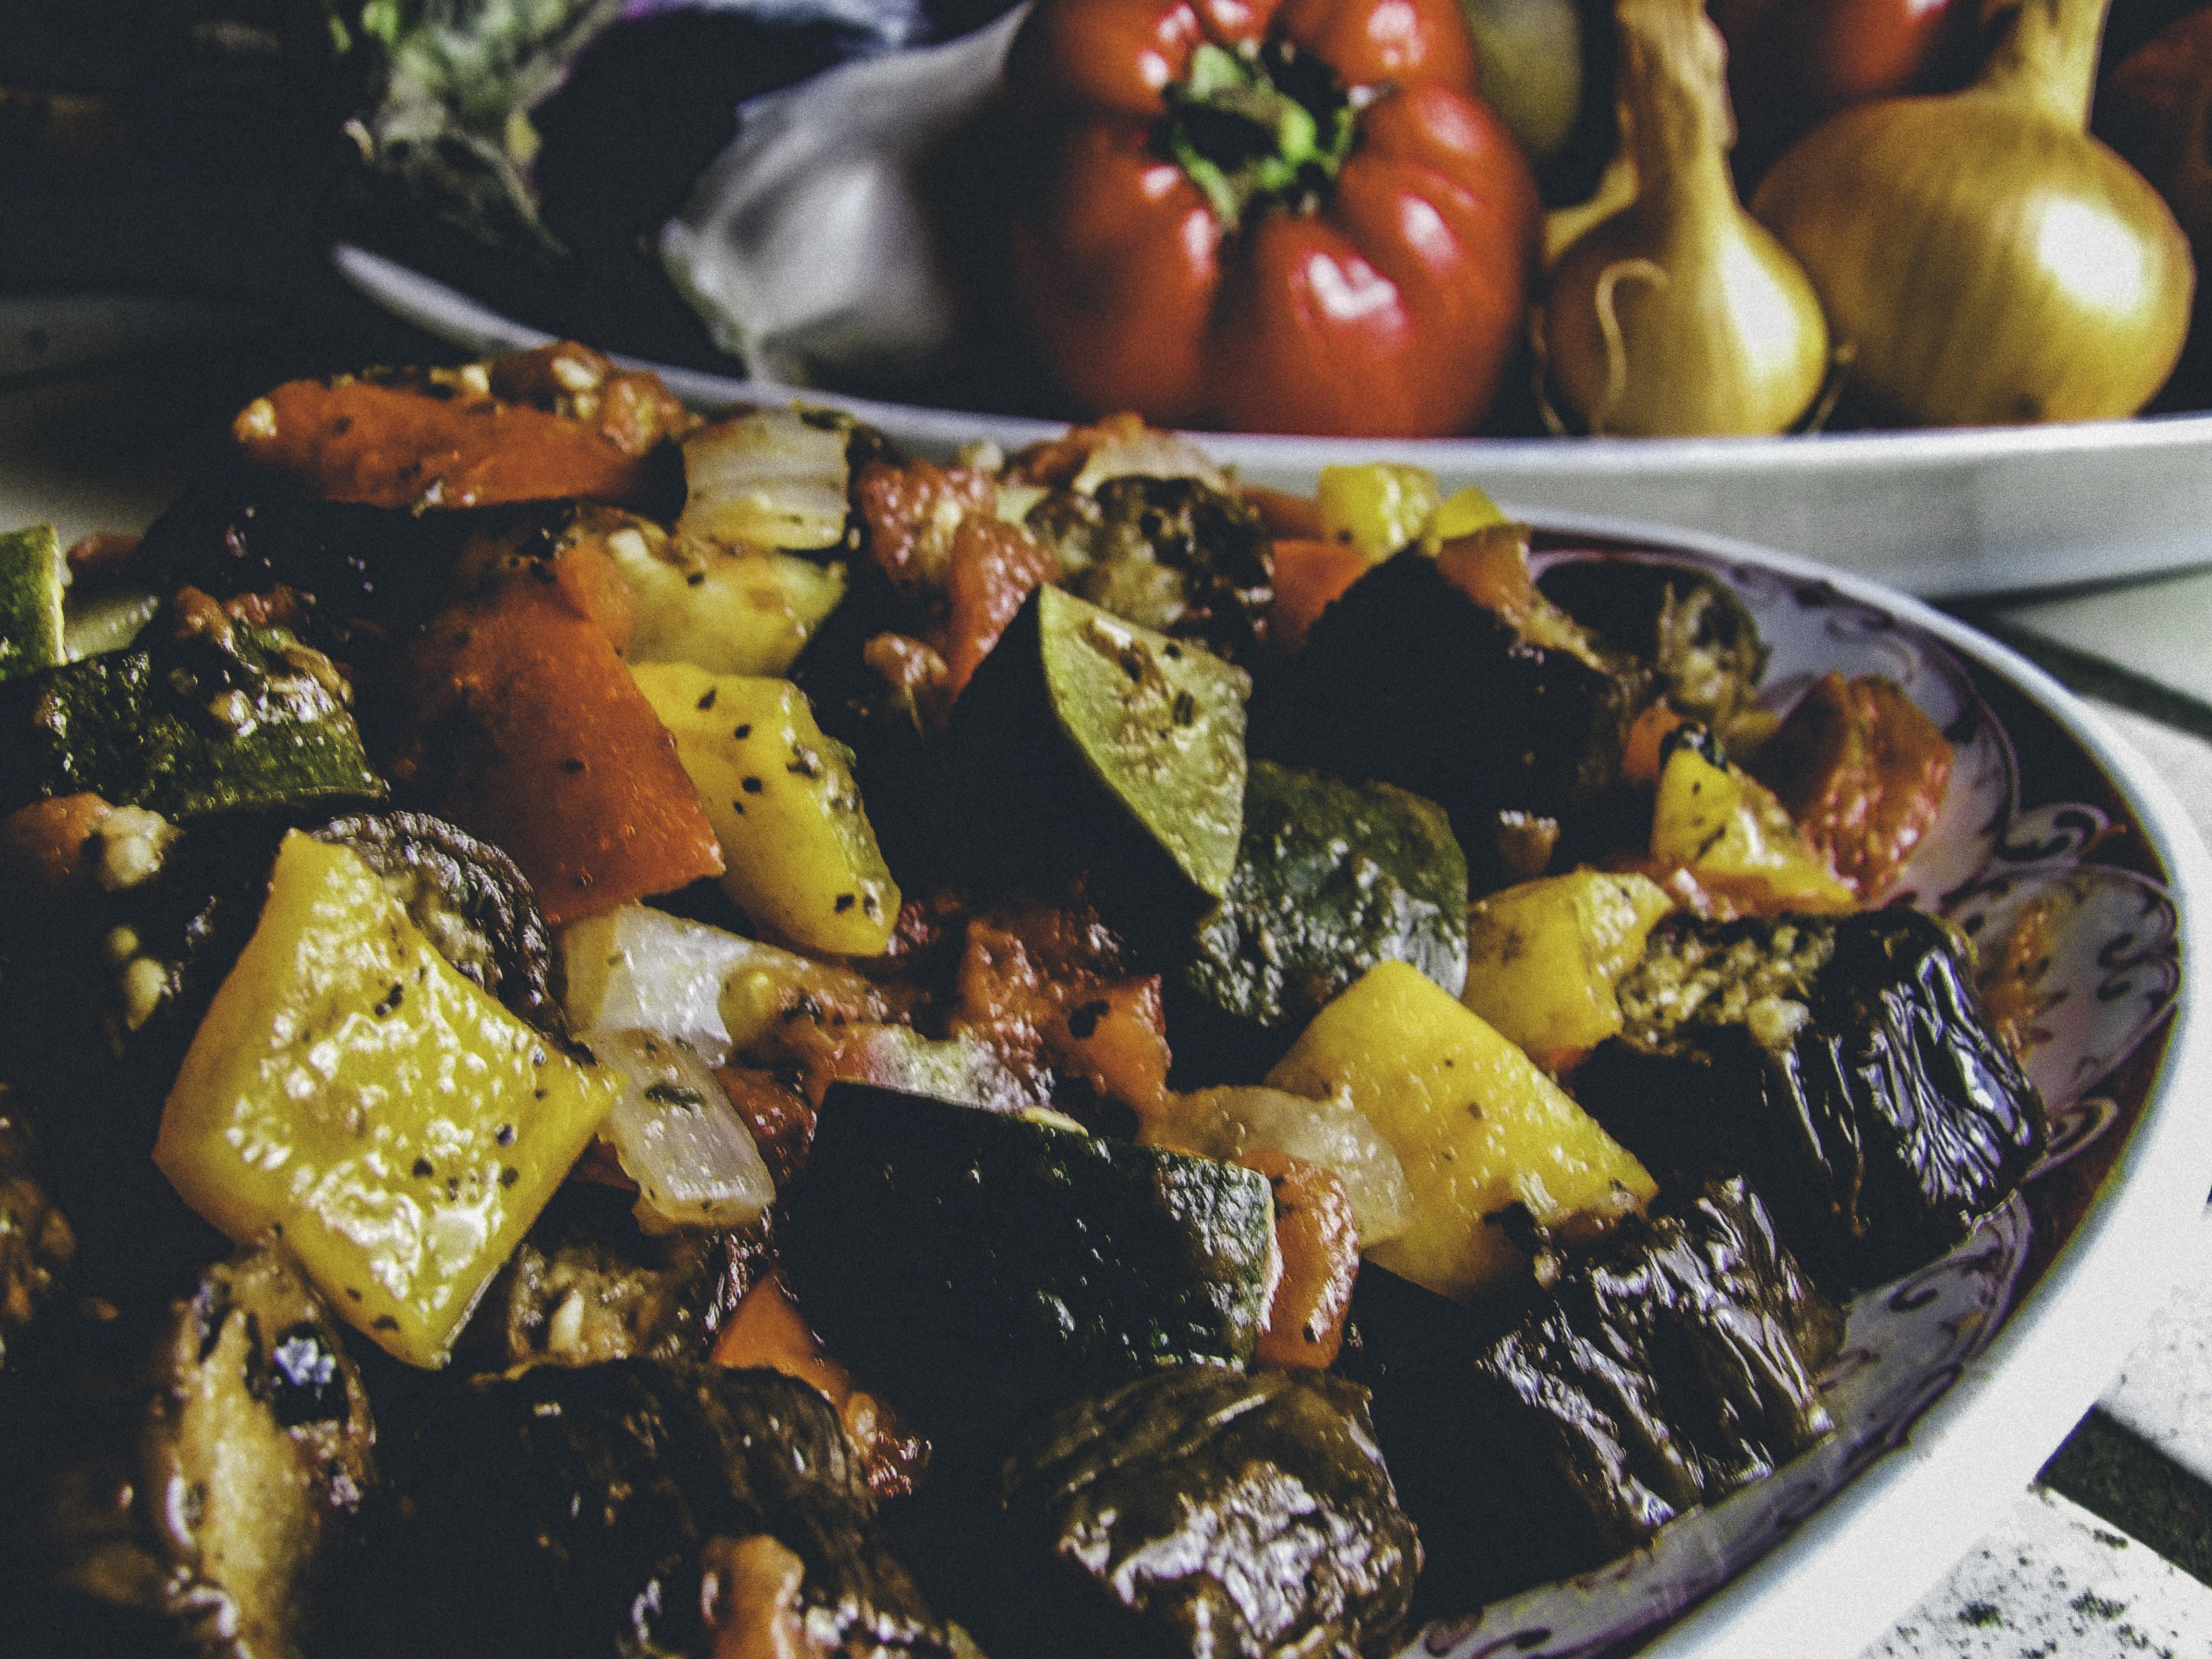 Veggie Entree Recipe: Rough-Cut Ratatouille Featuring Organic Heirloom Garden Veggies